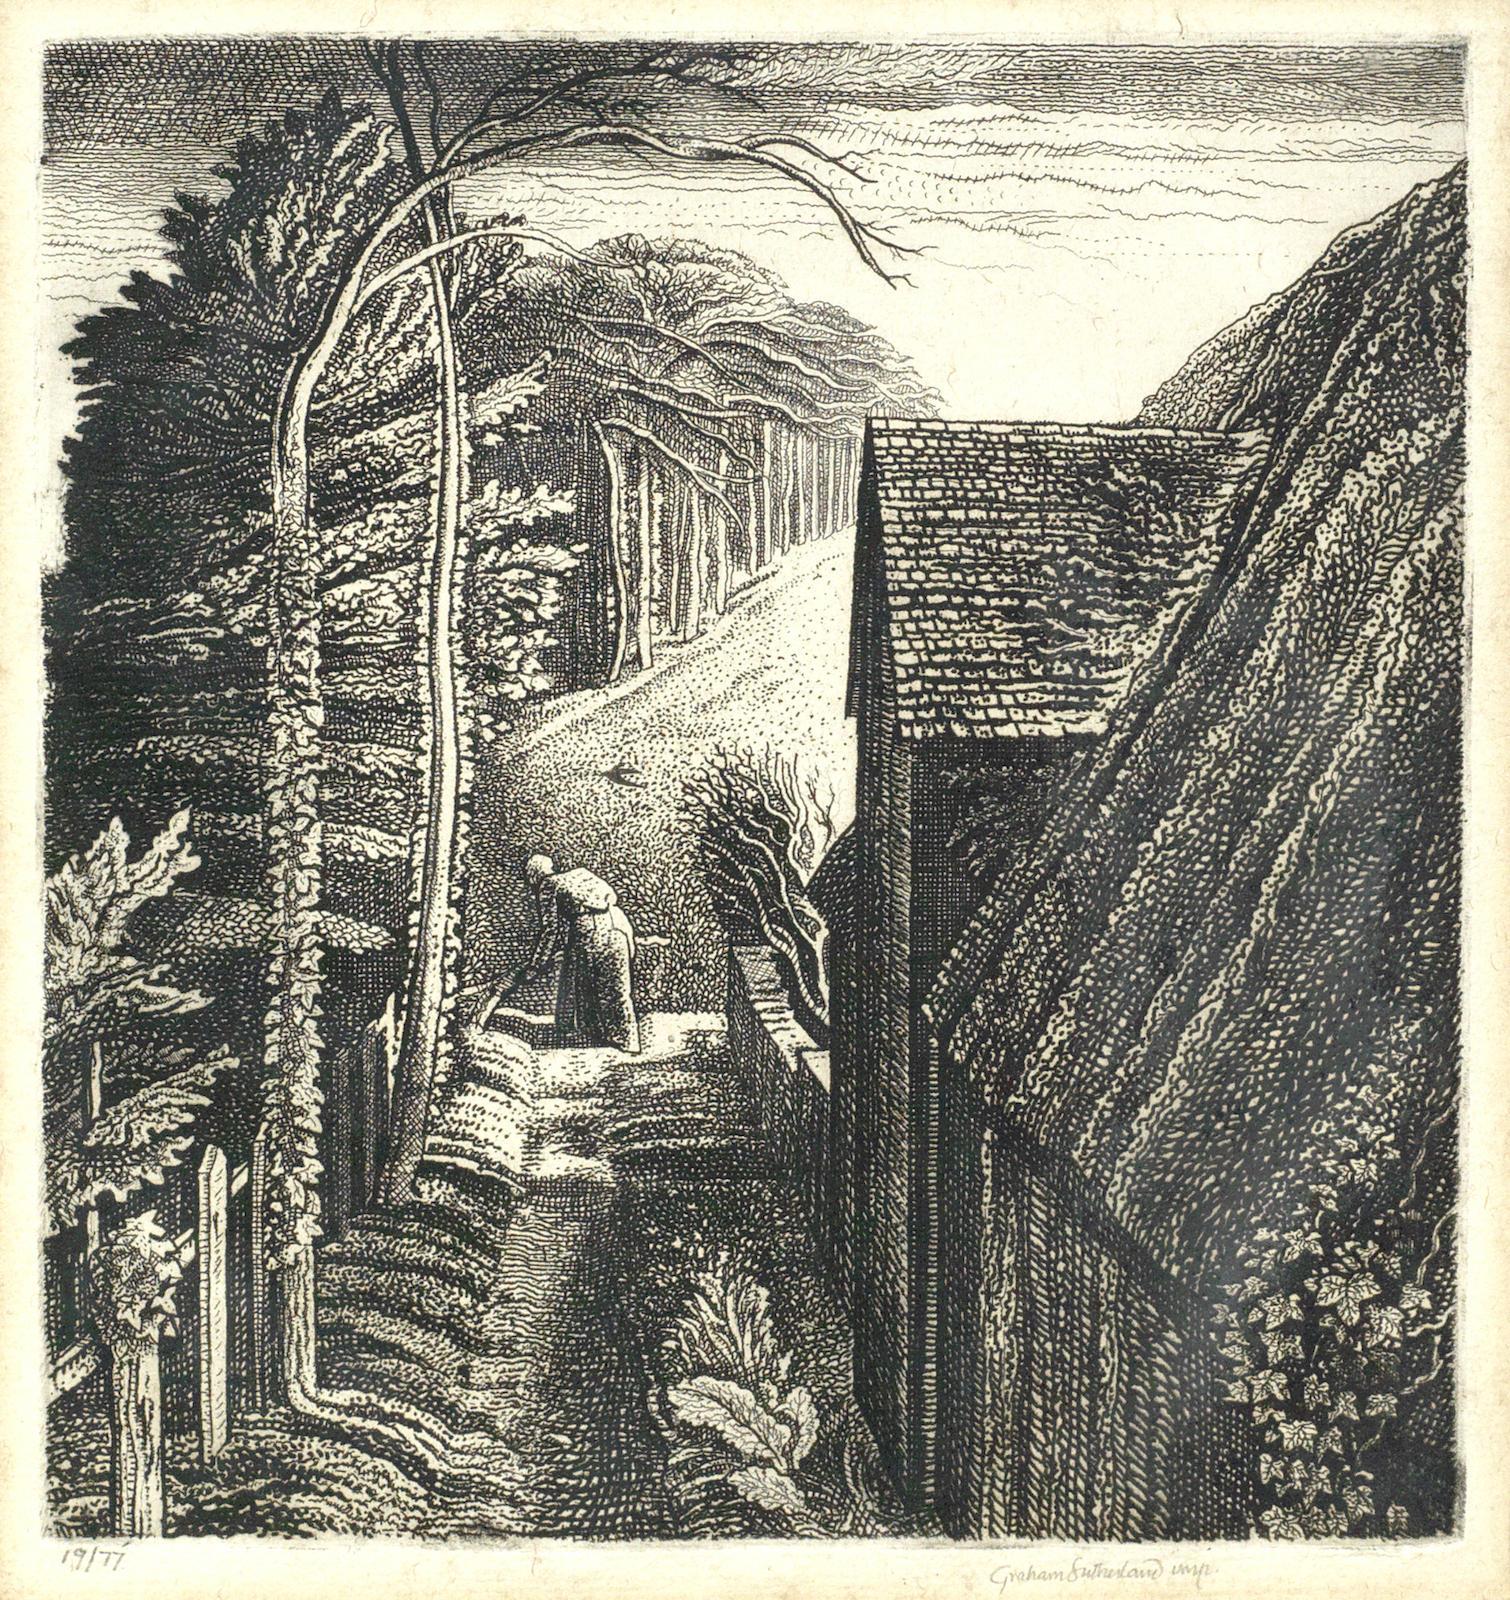 Graham Sutherland-Hanger Hill-1929